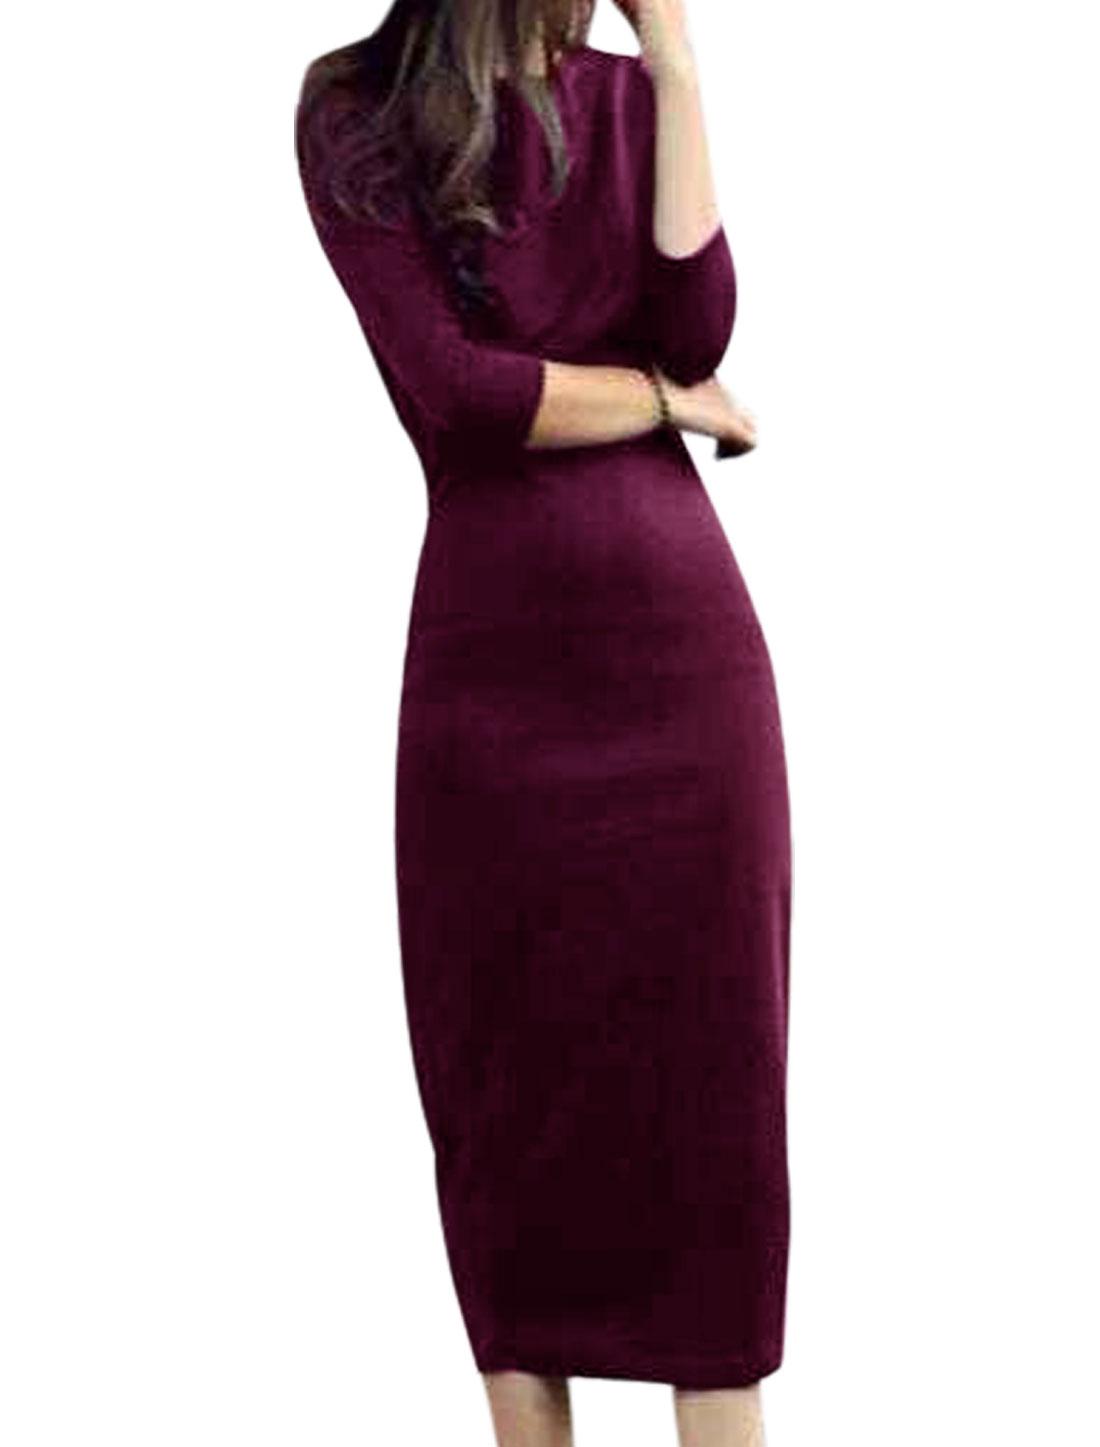 Split Back Slipover Closed Fit Dark Purple Sheath Dress for Ladies XS